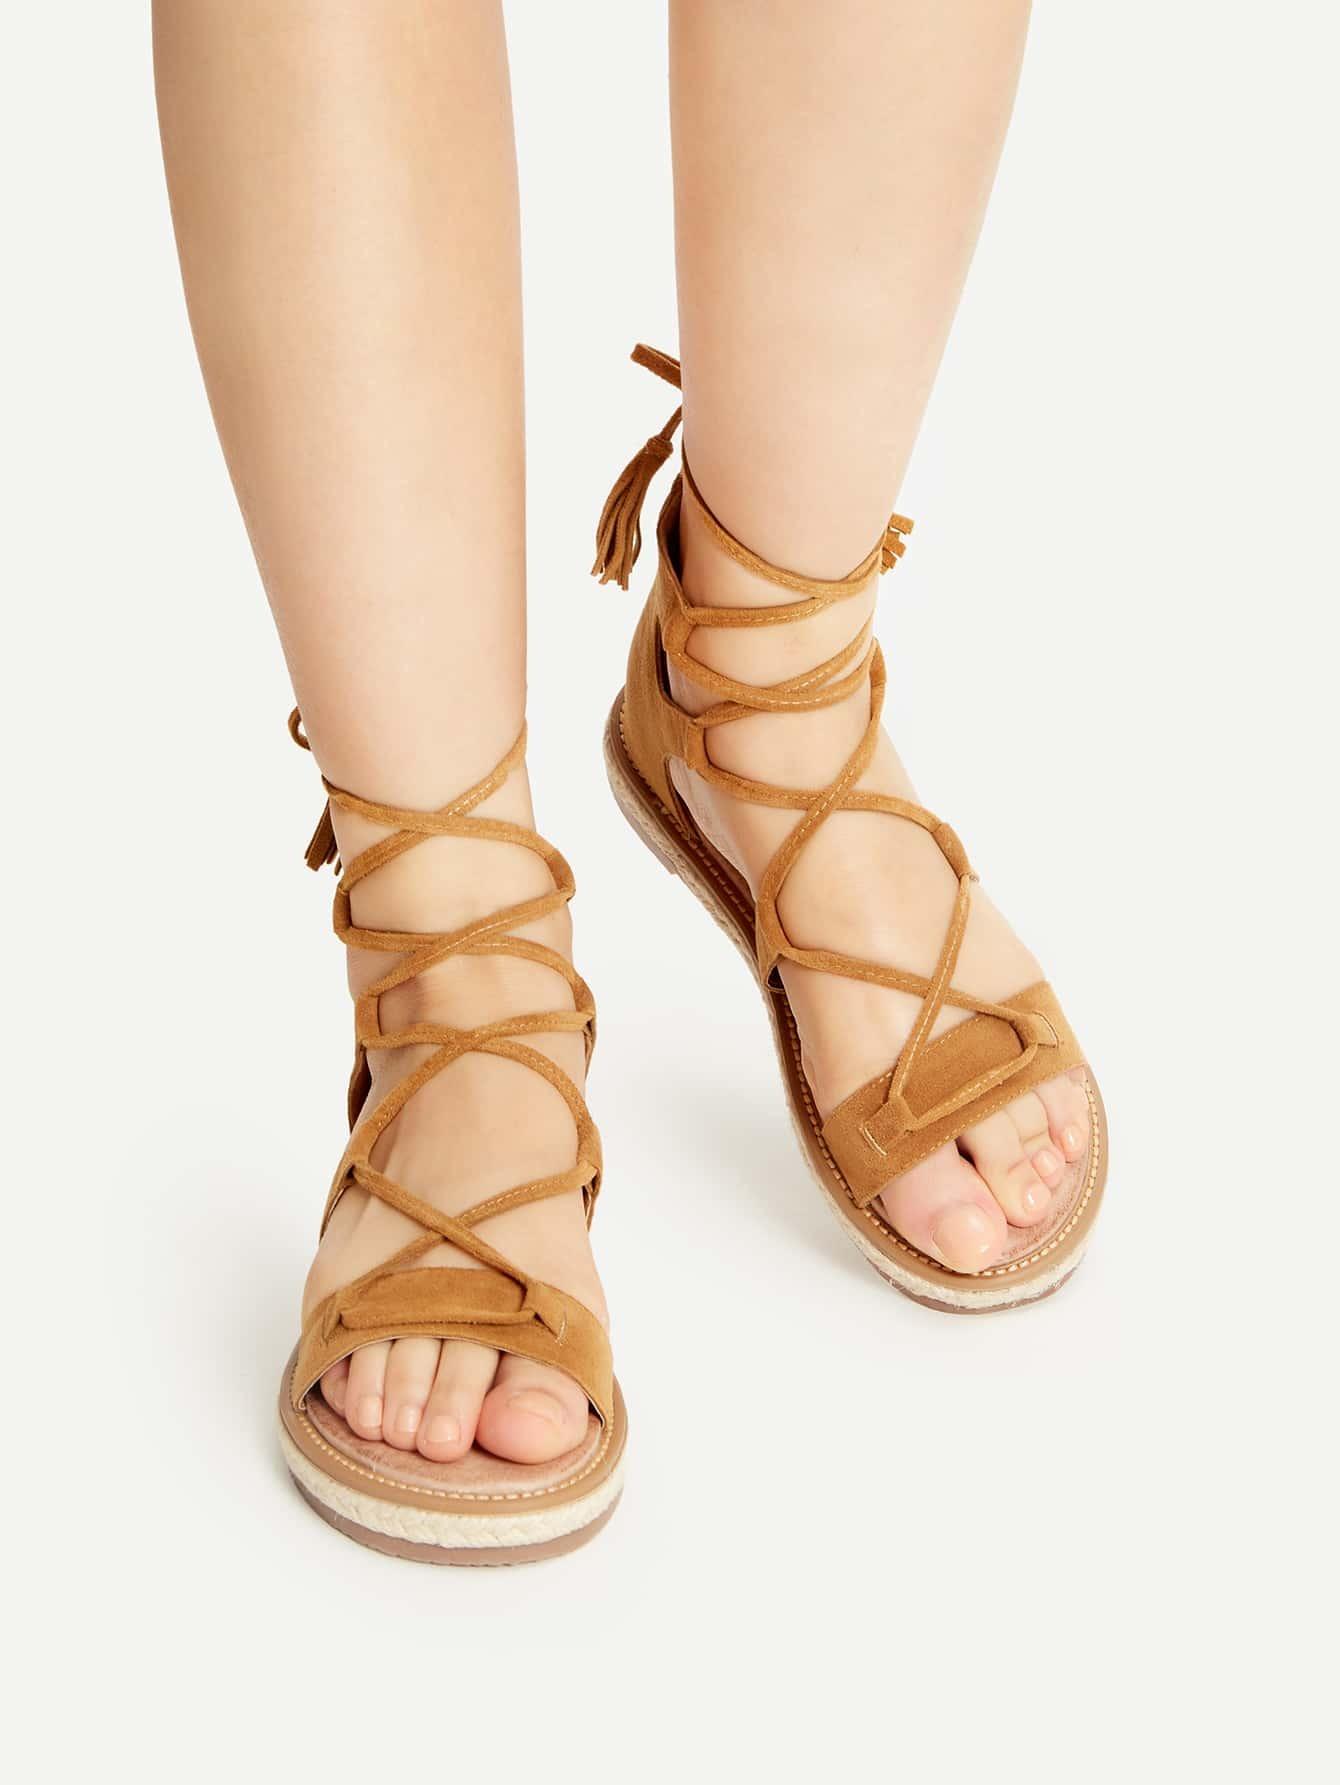 bebc218544ec Brown Lace Up Espadrille Flat Sandals With Tassel EmmaCloth-Women ...